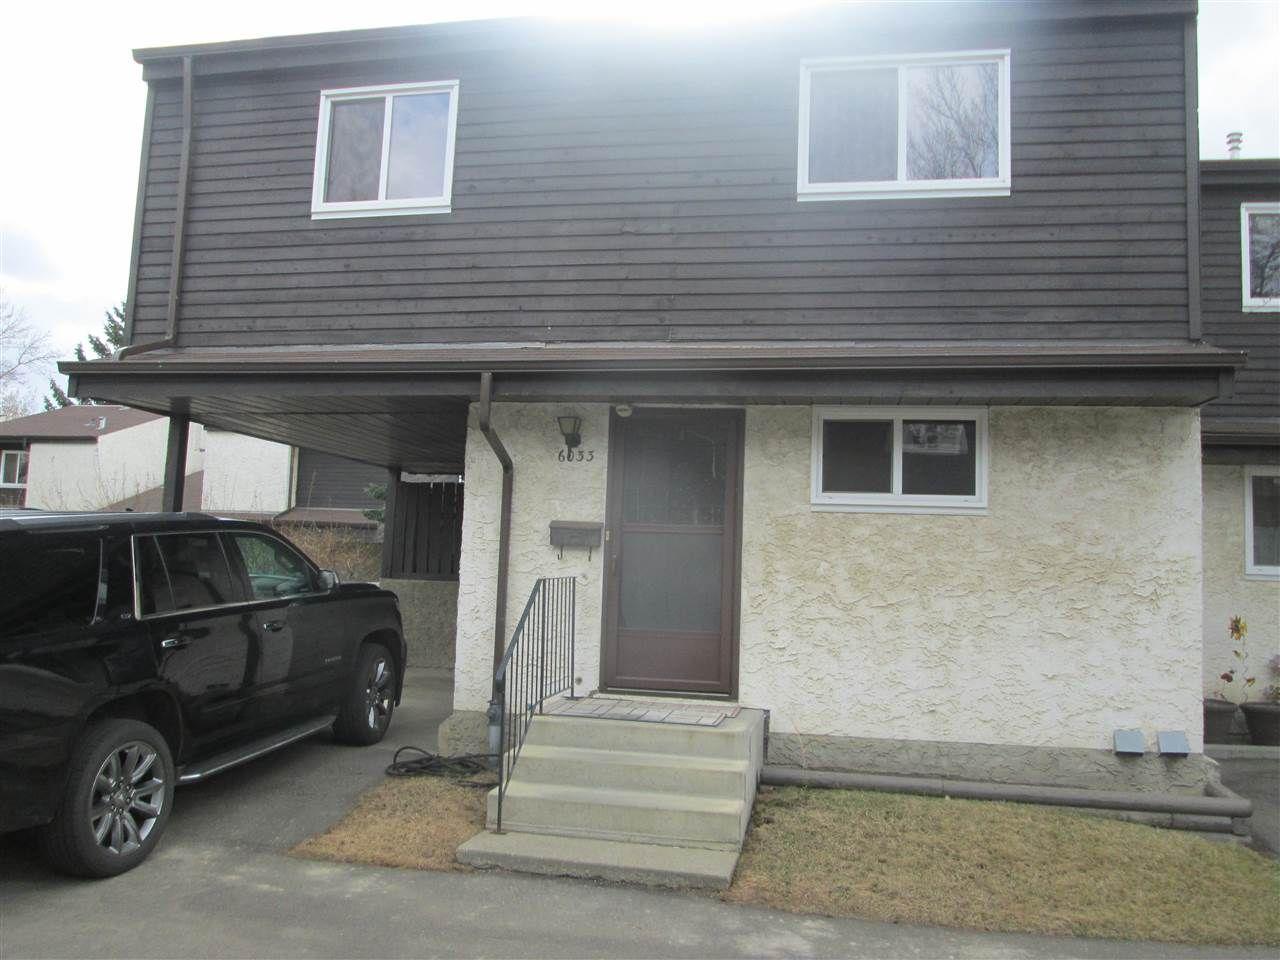 Main Photo: 6033 35A Avenue in Edmonton: Zone 29 Townhouse for sale : MLS®# E4242452